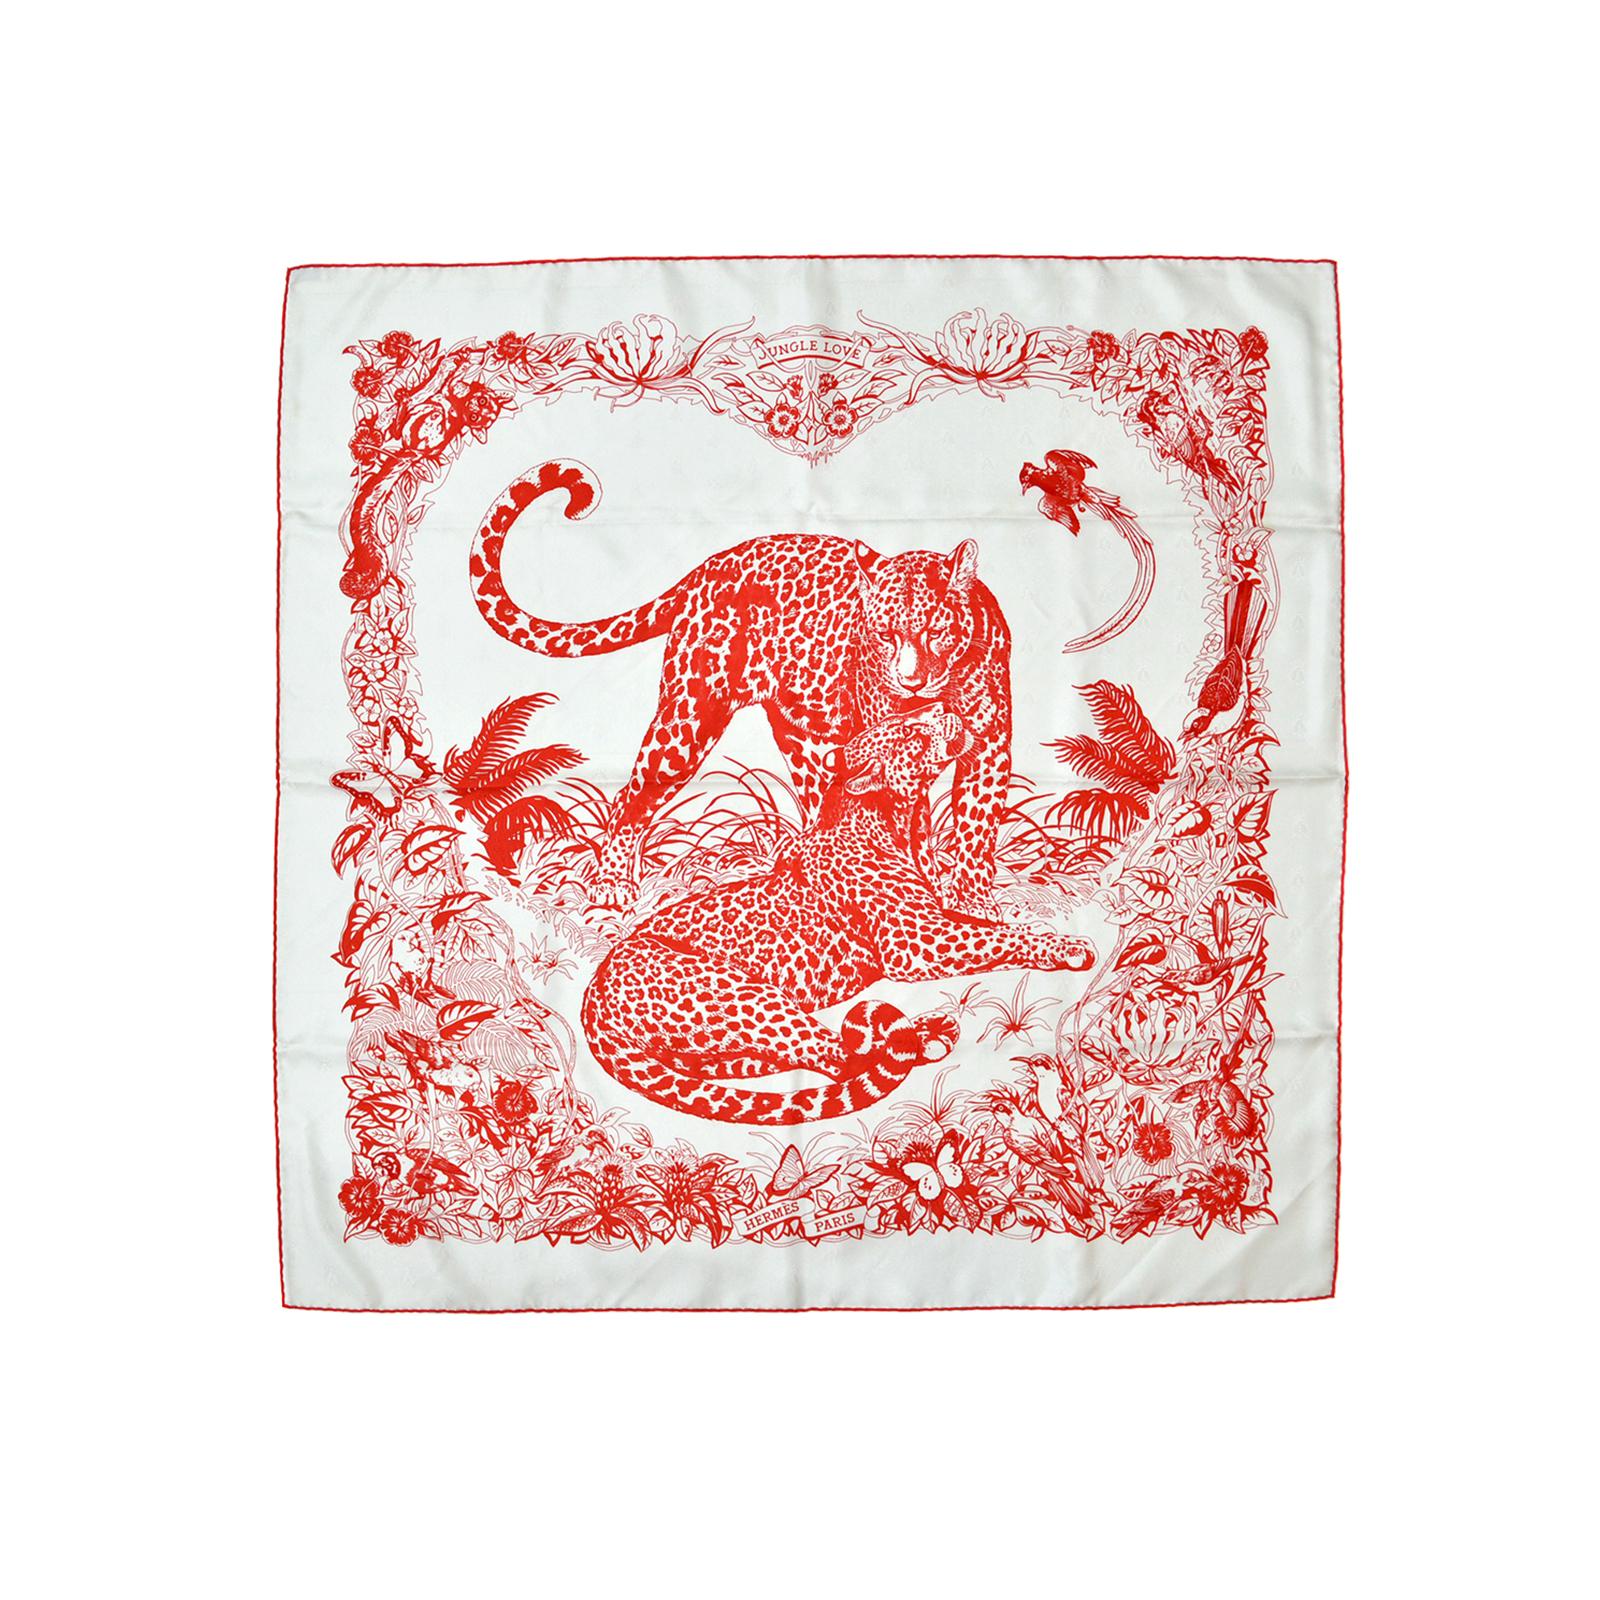 Hermes Jungle Love Silk Scarf HM160069